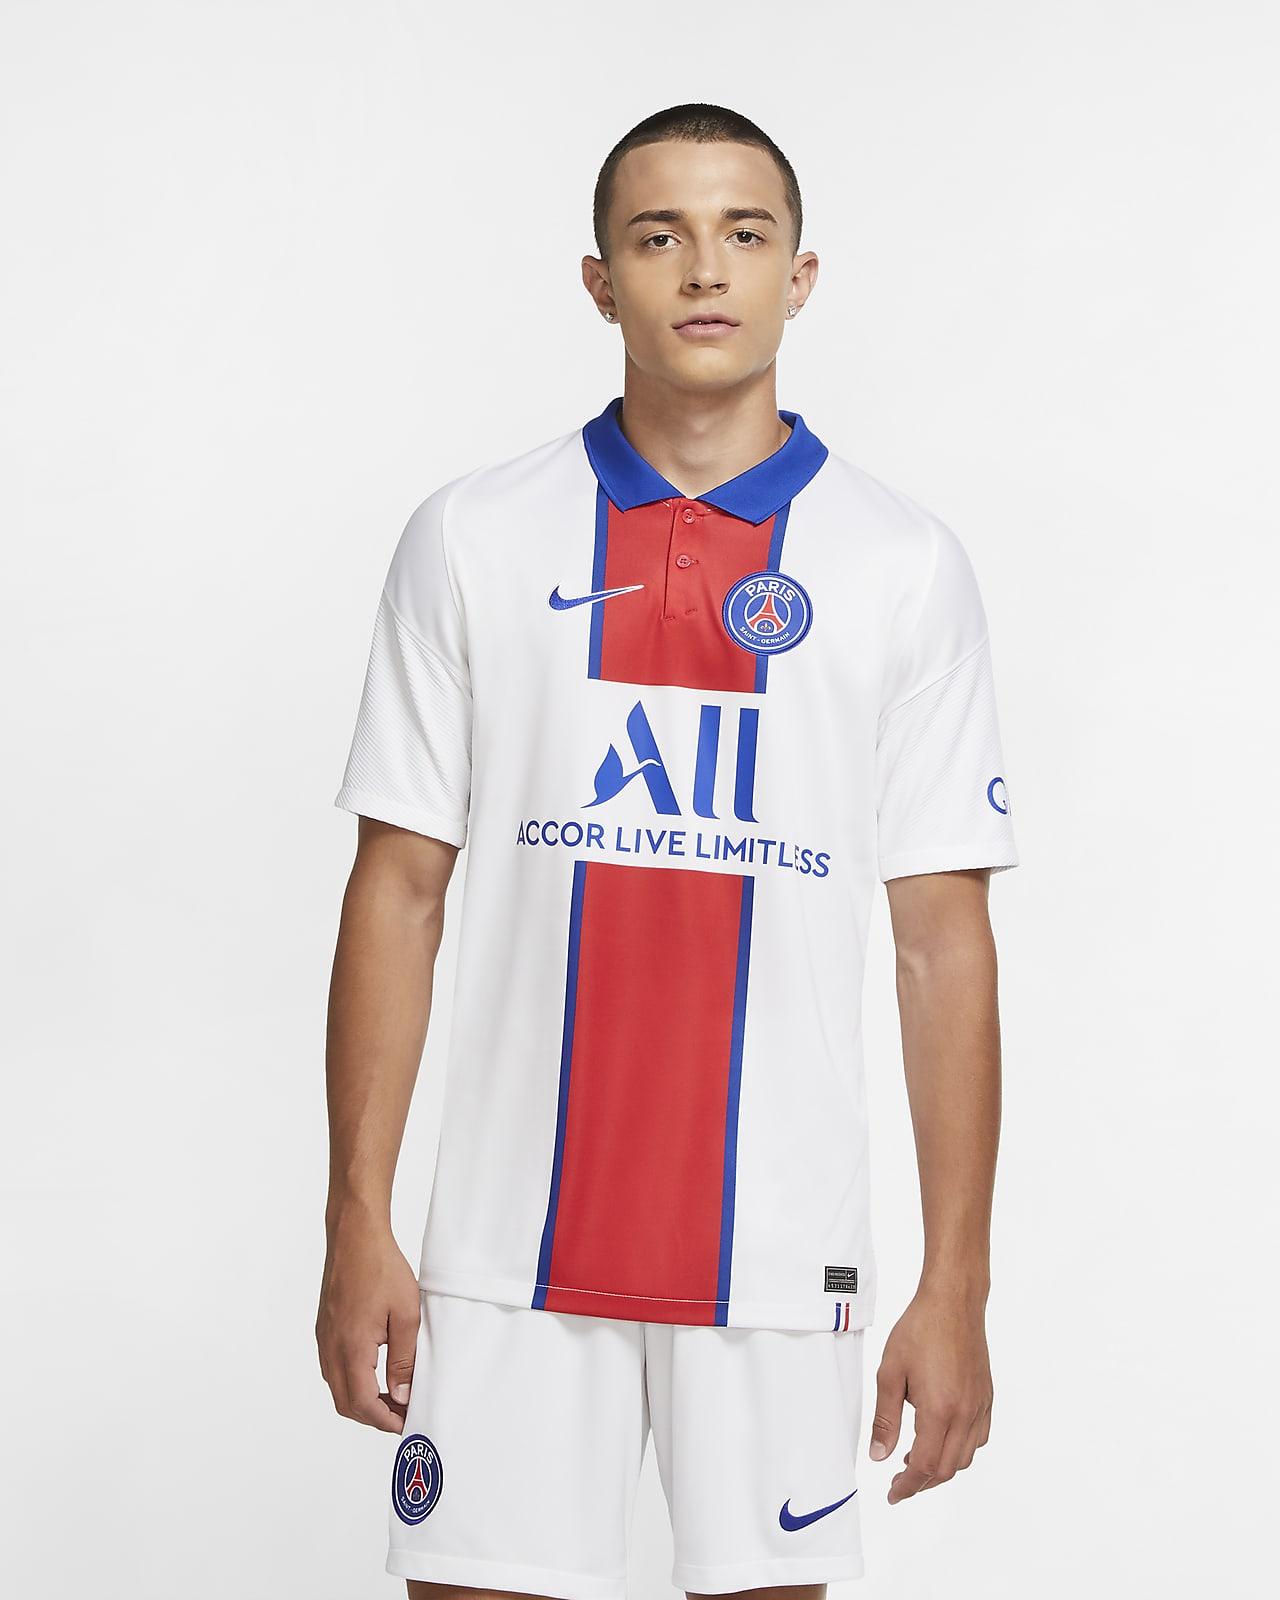 Camiseta de fútbol de visitante para hombre Stadium del Paris Saint-Germain 2020/21